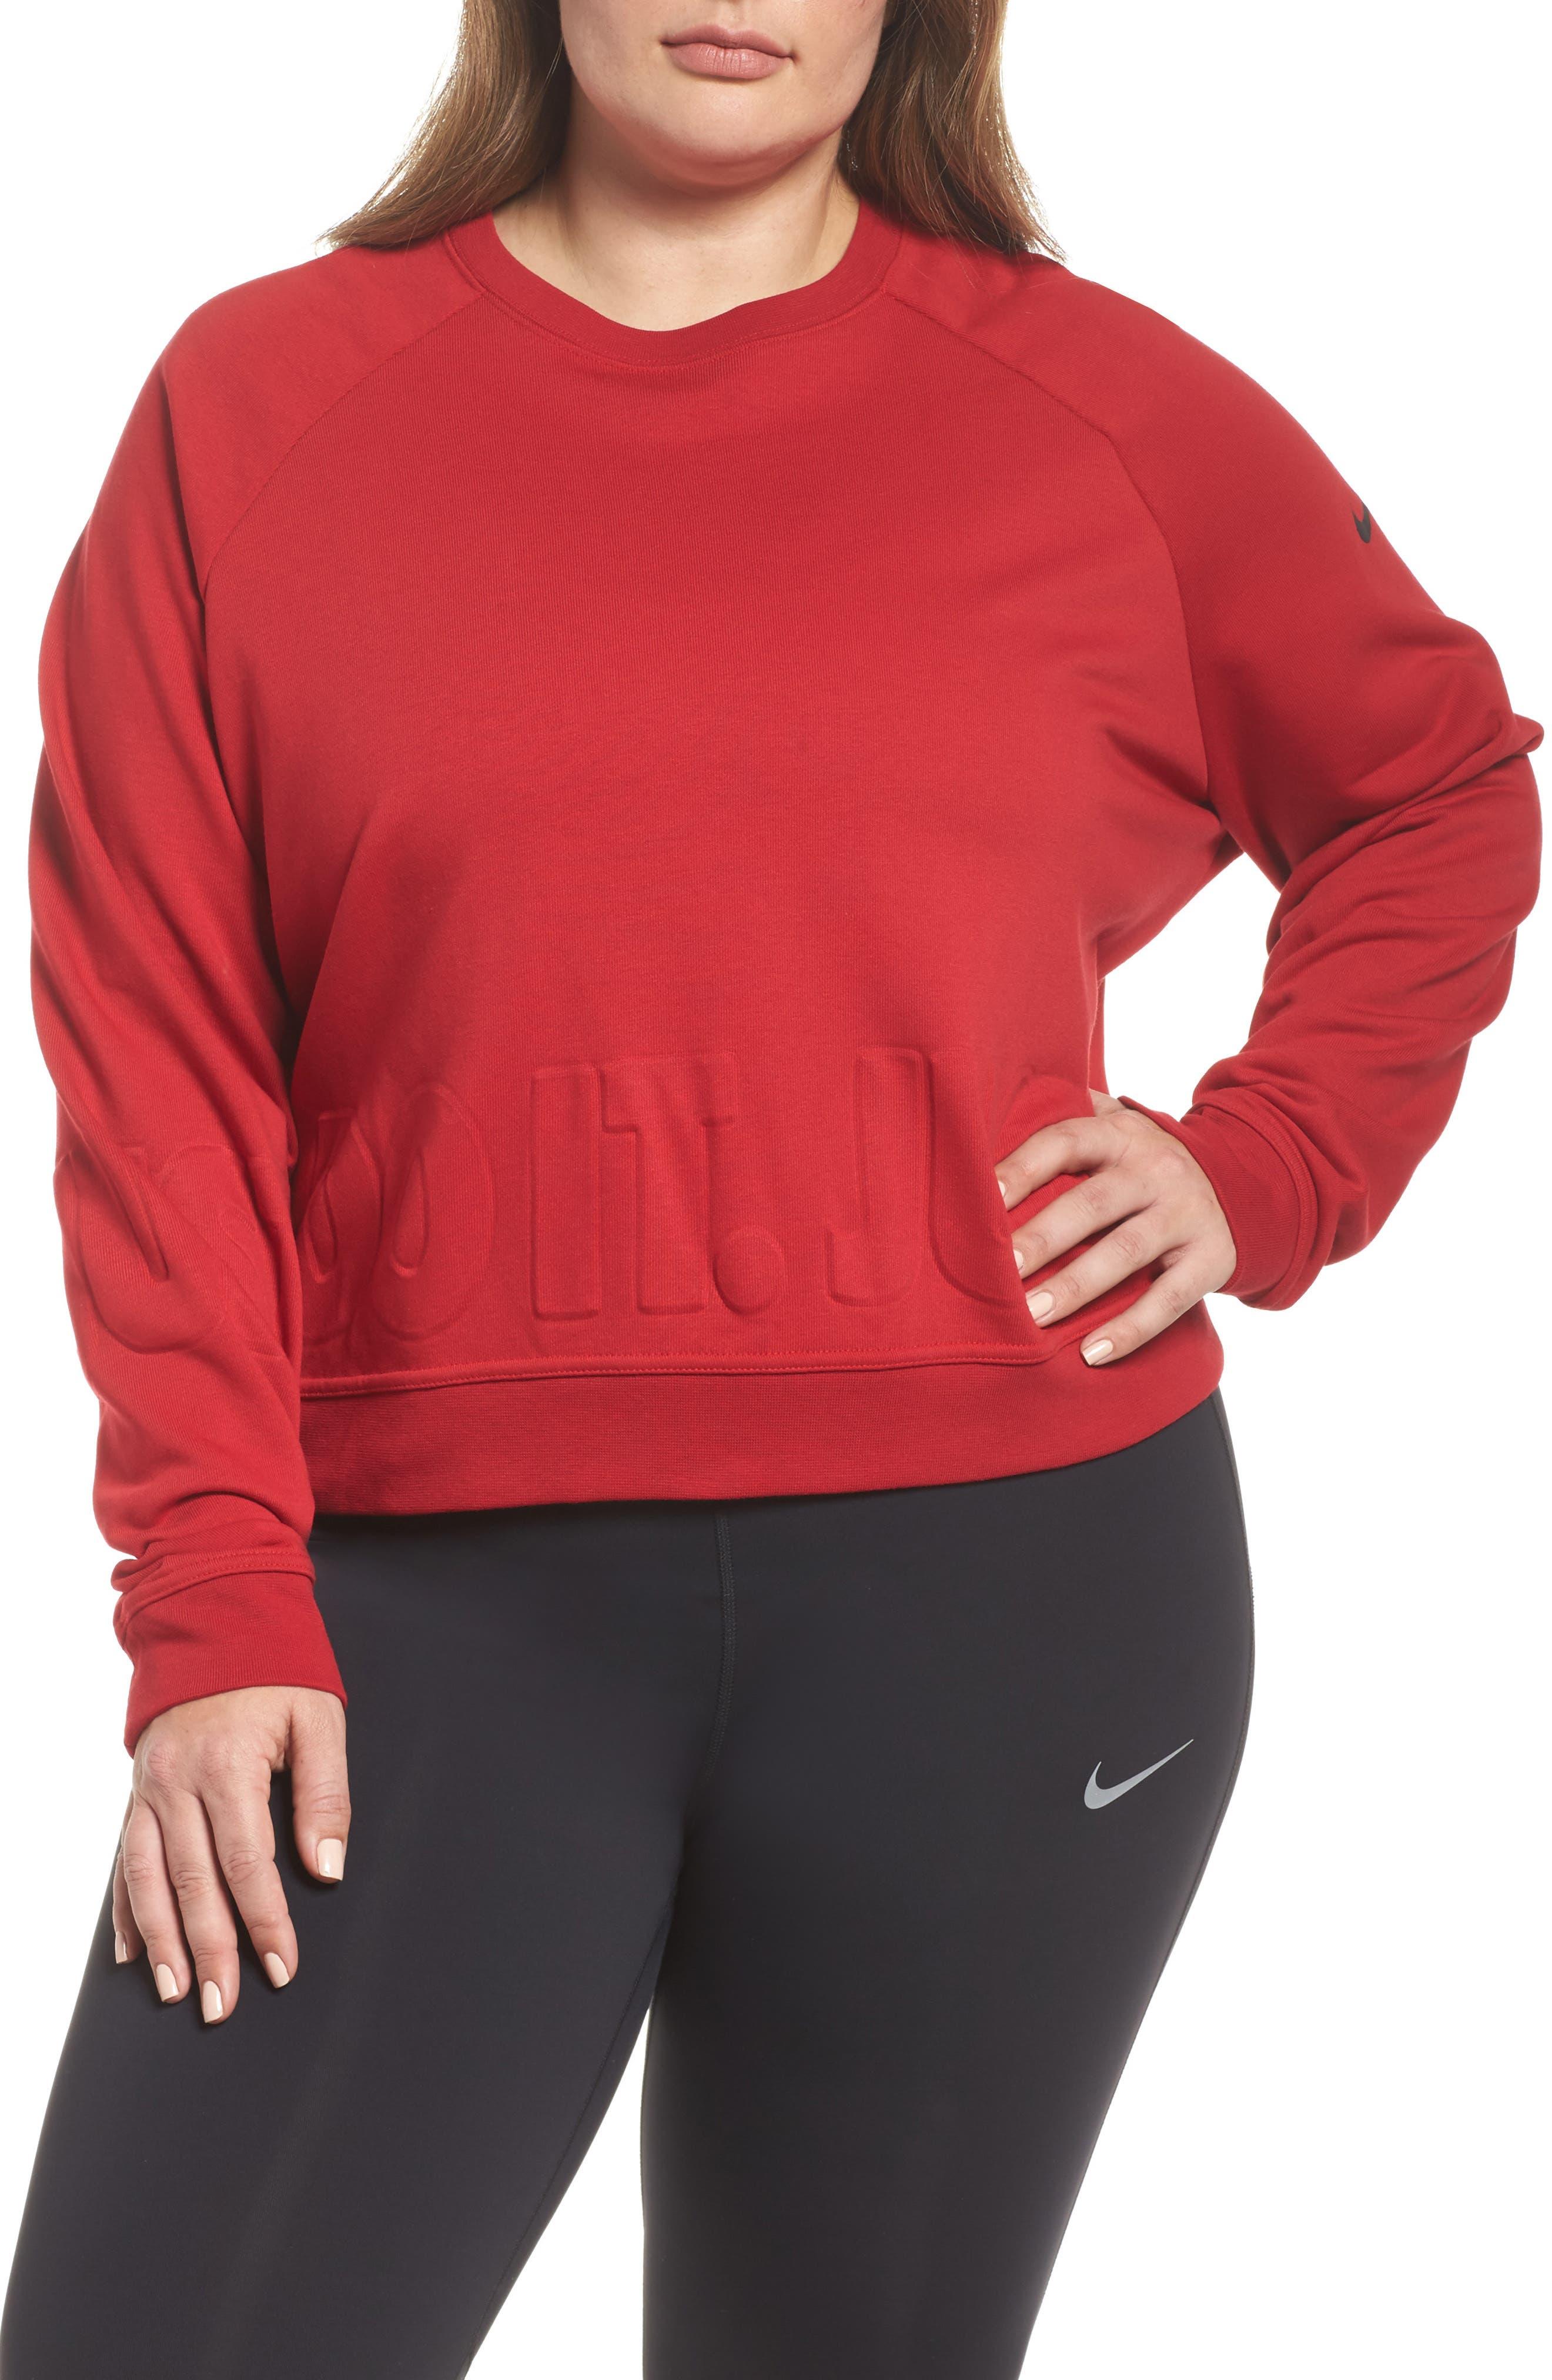 Dry Versa Training Top,                         Main,                         color, Gym Red/ Black